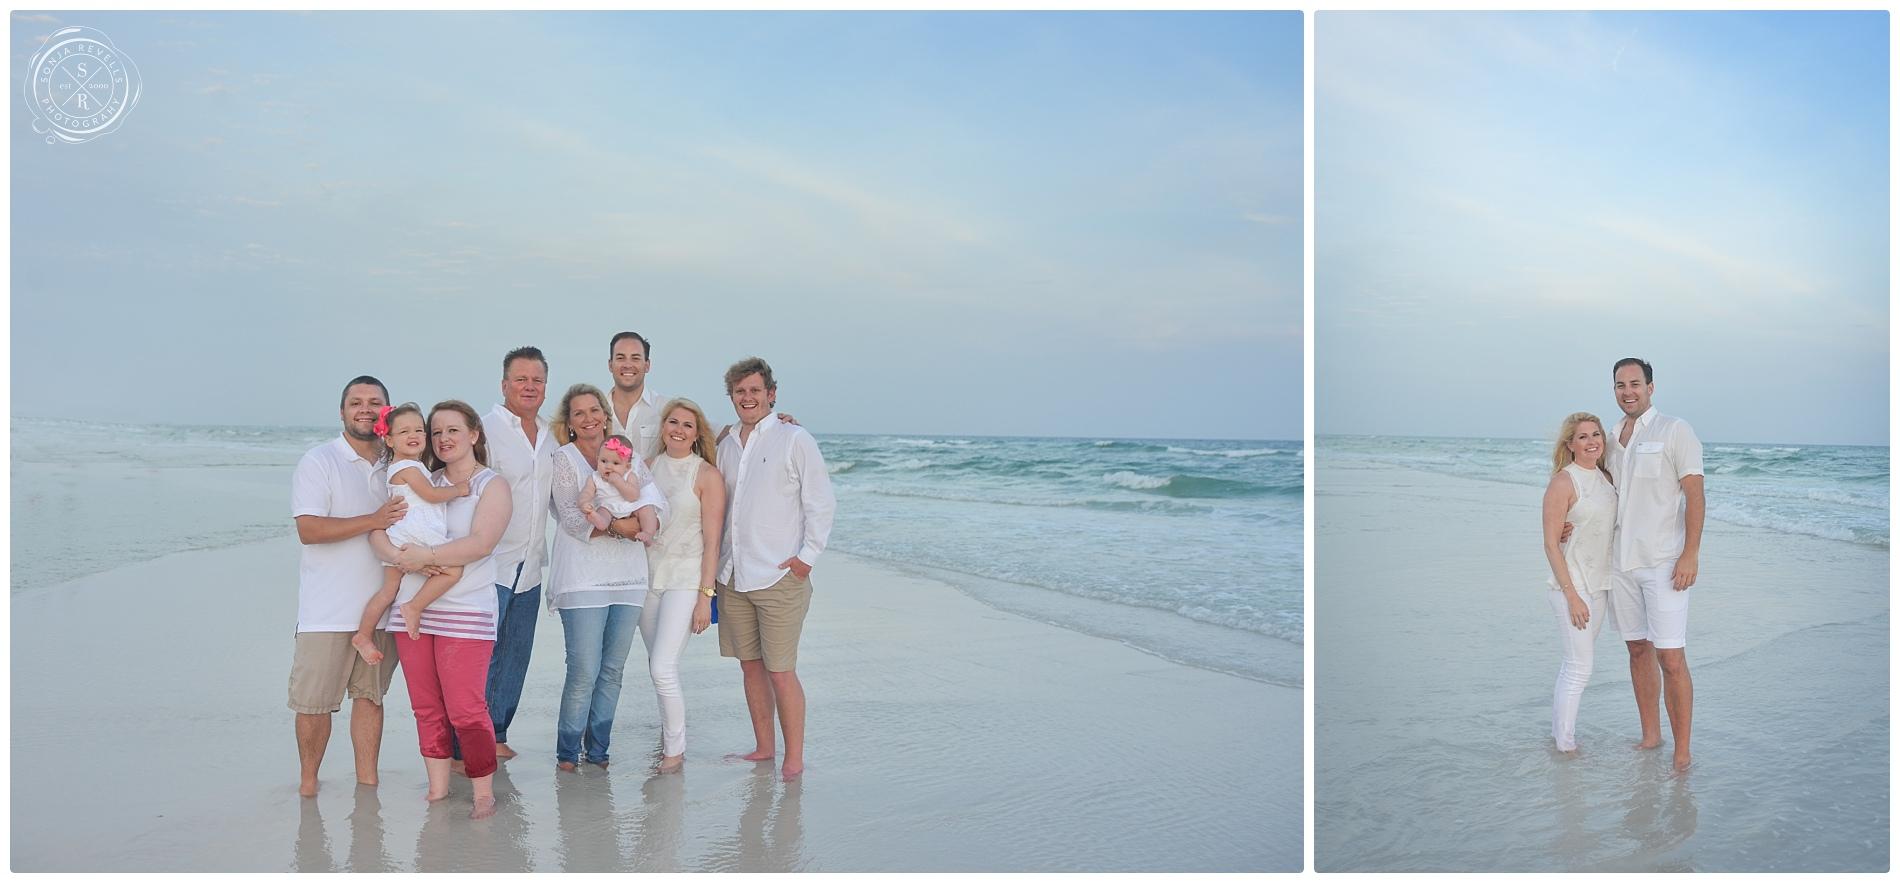 Beach Family Portrait Photographer,Wedding Photography,